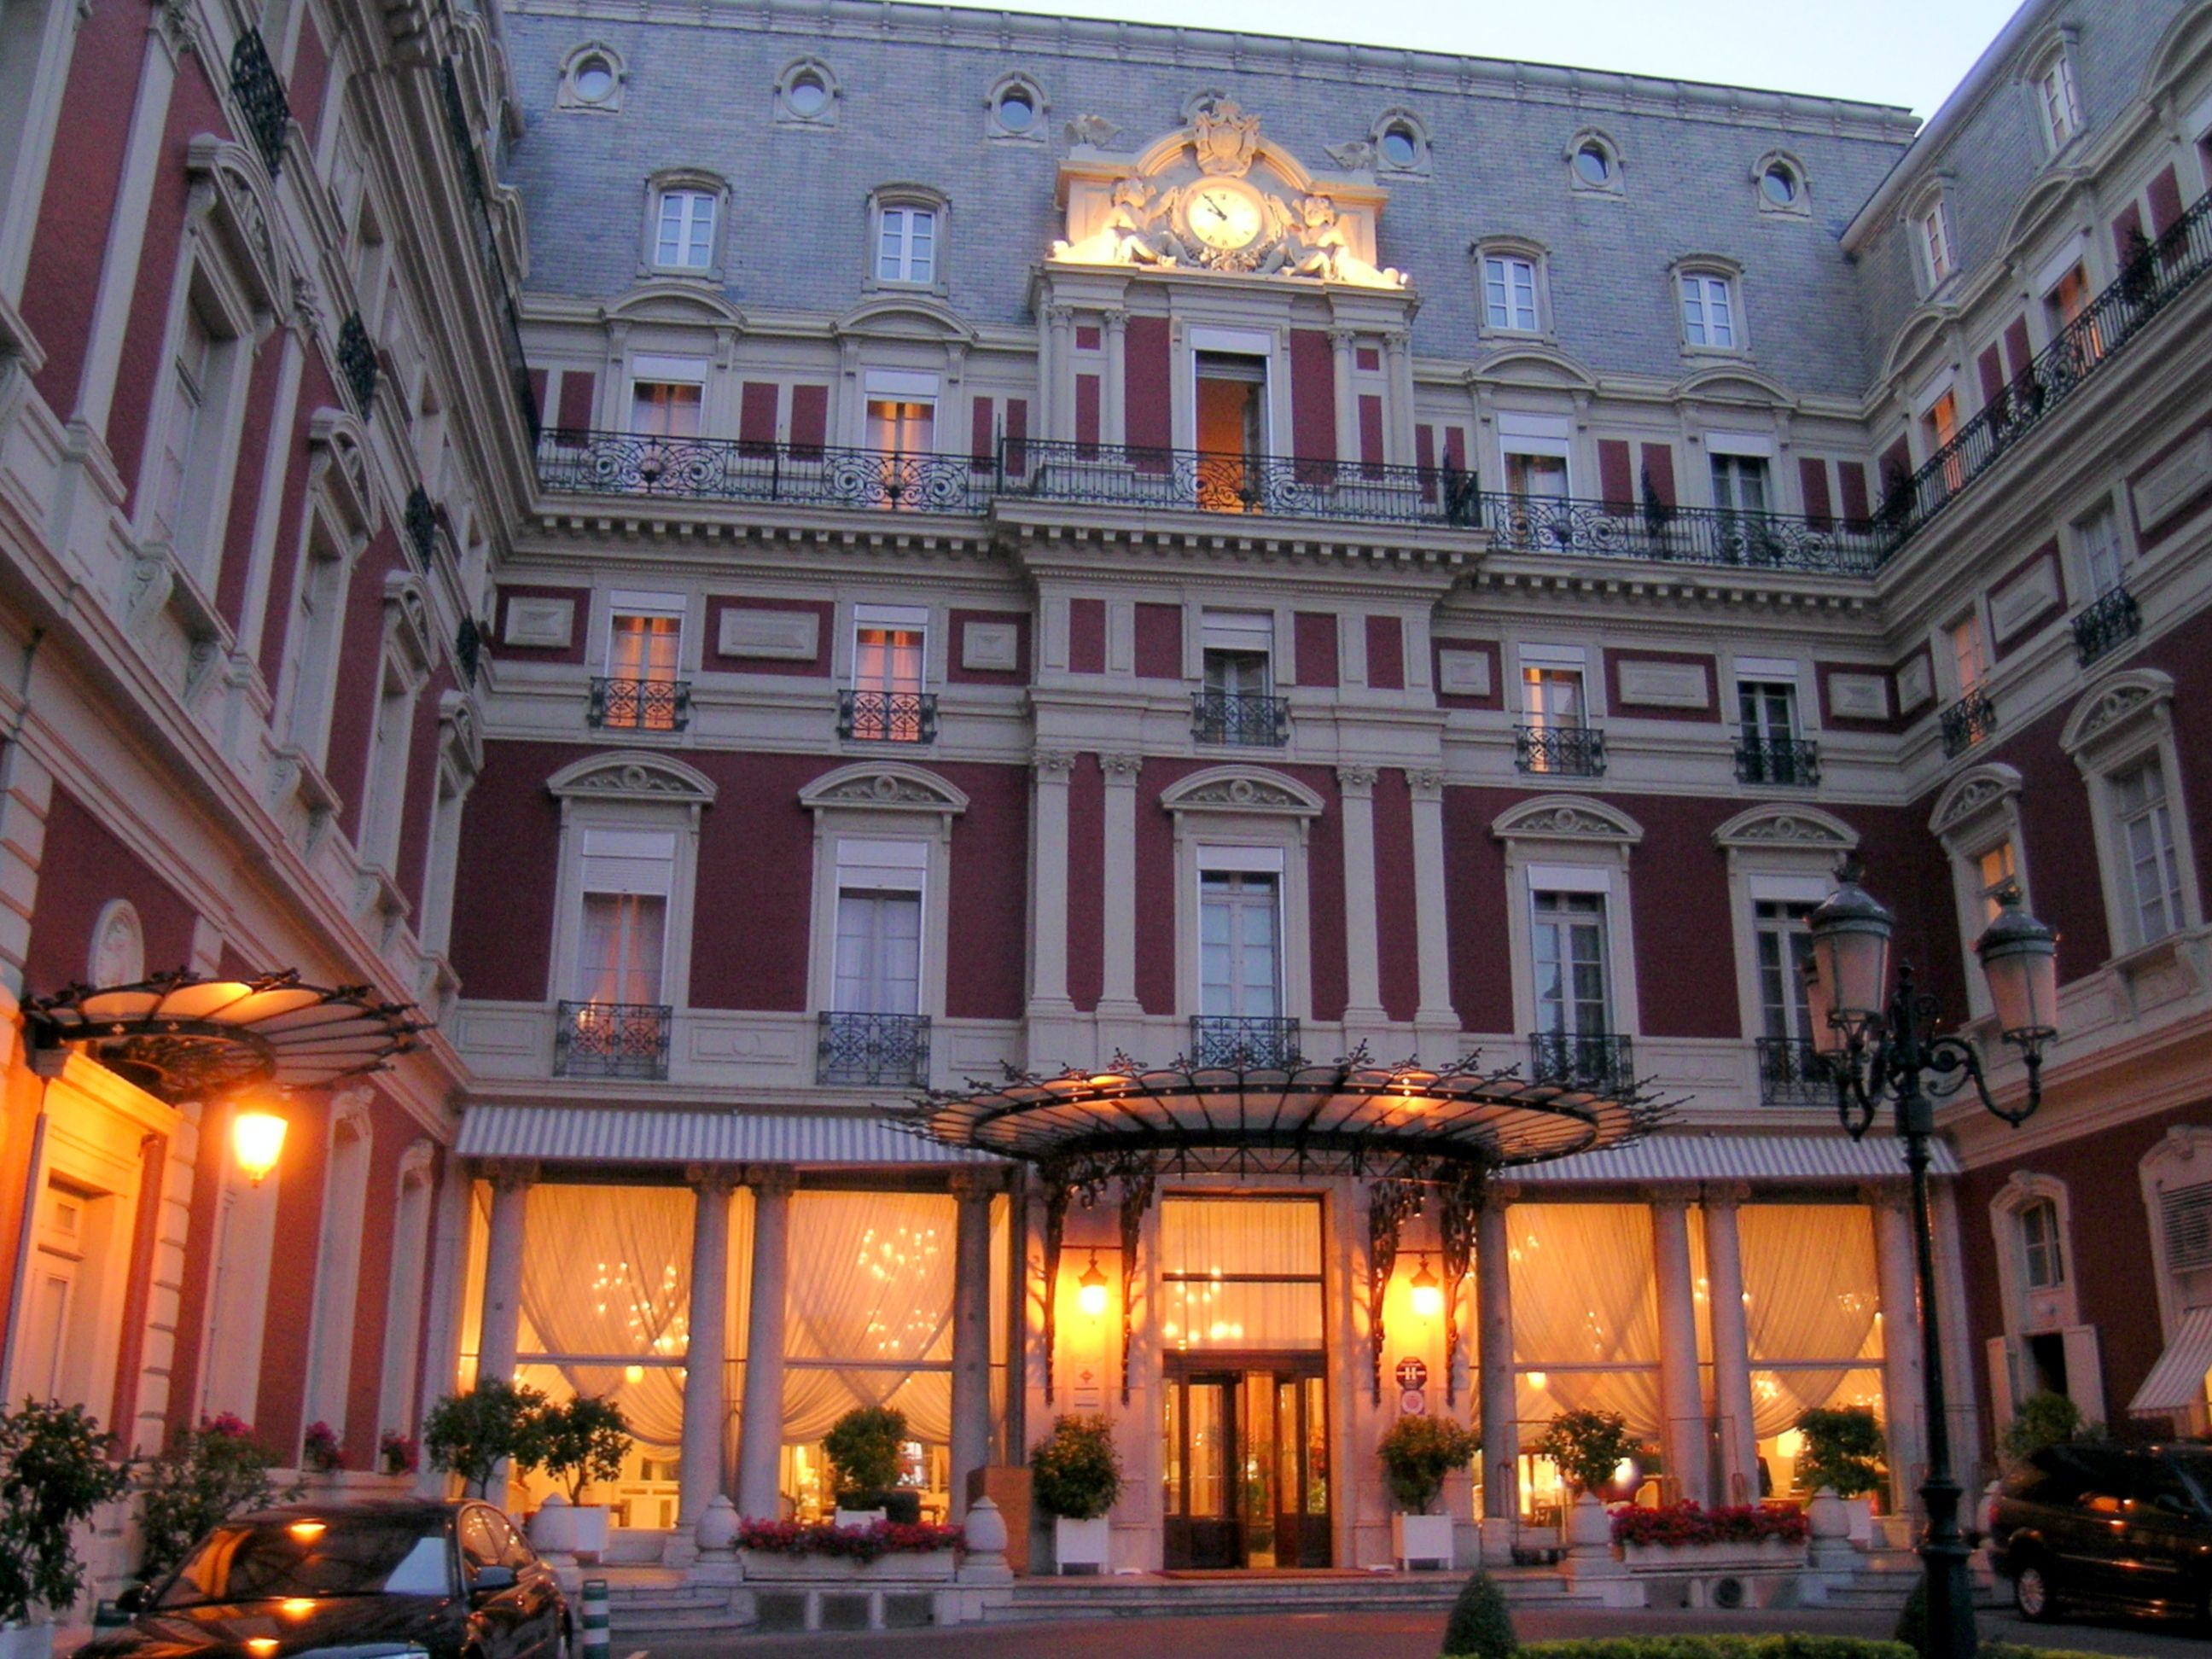 Hotel Du Palais Biarritz France